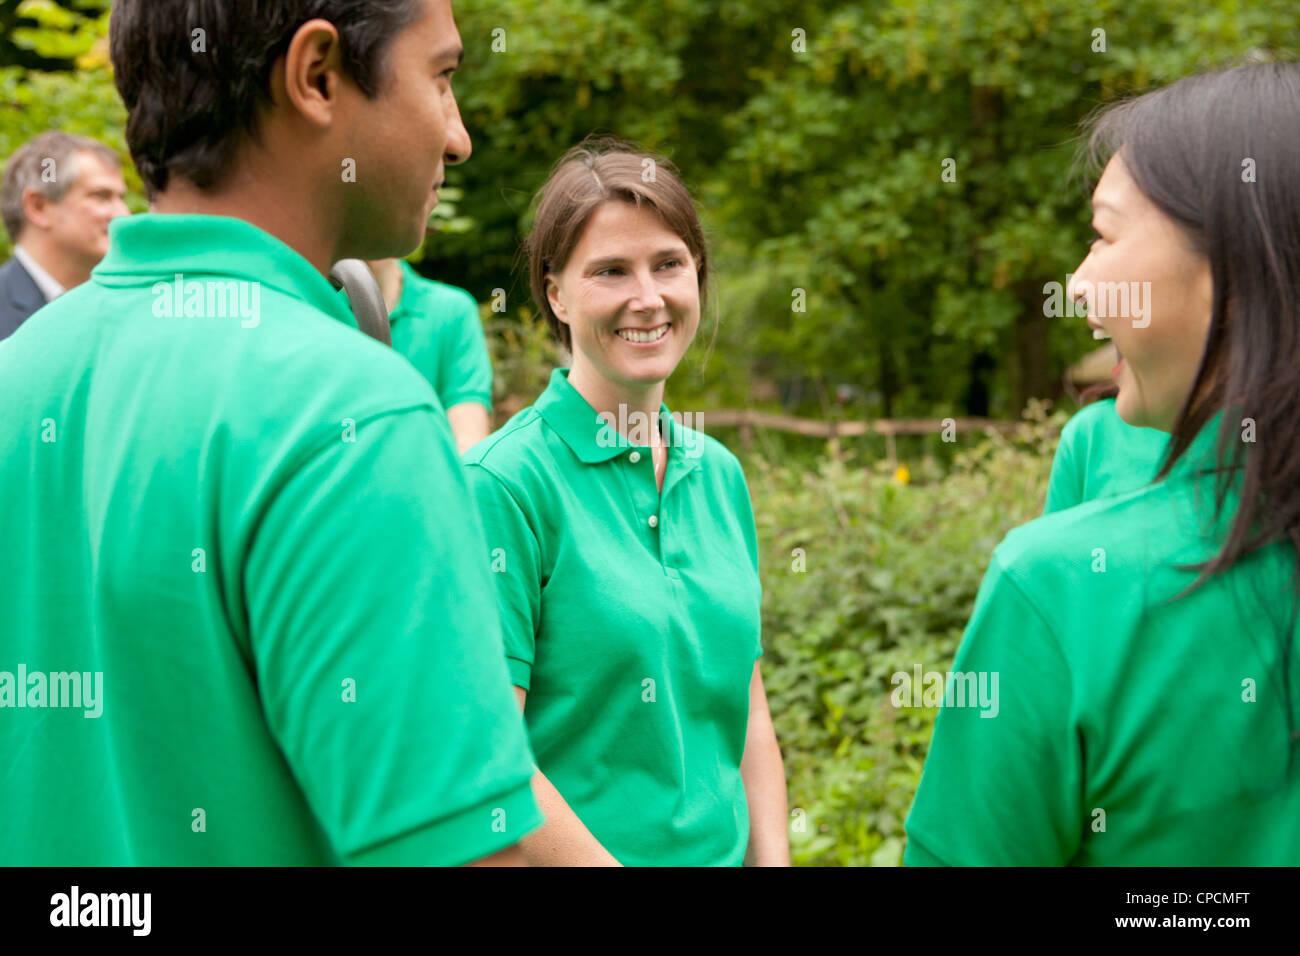 Gardeners talking in park - Stock Image